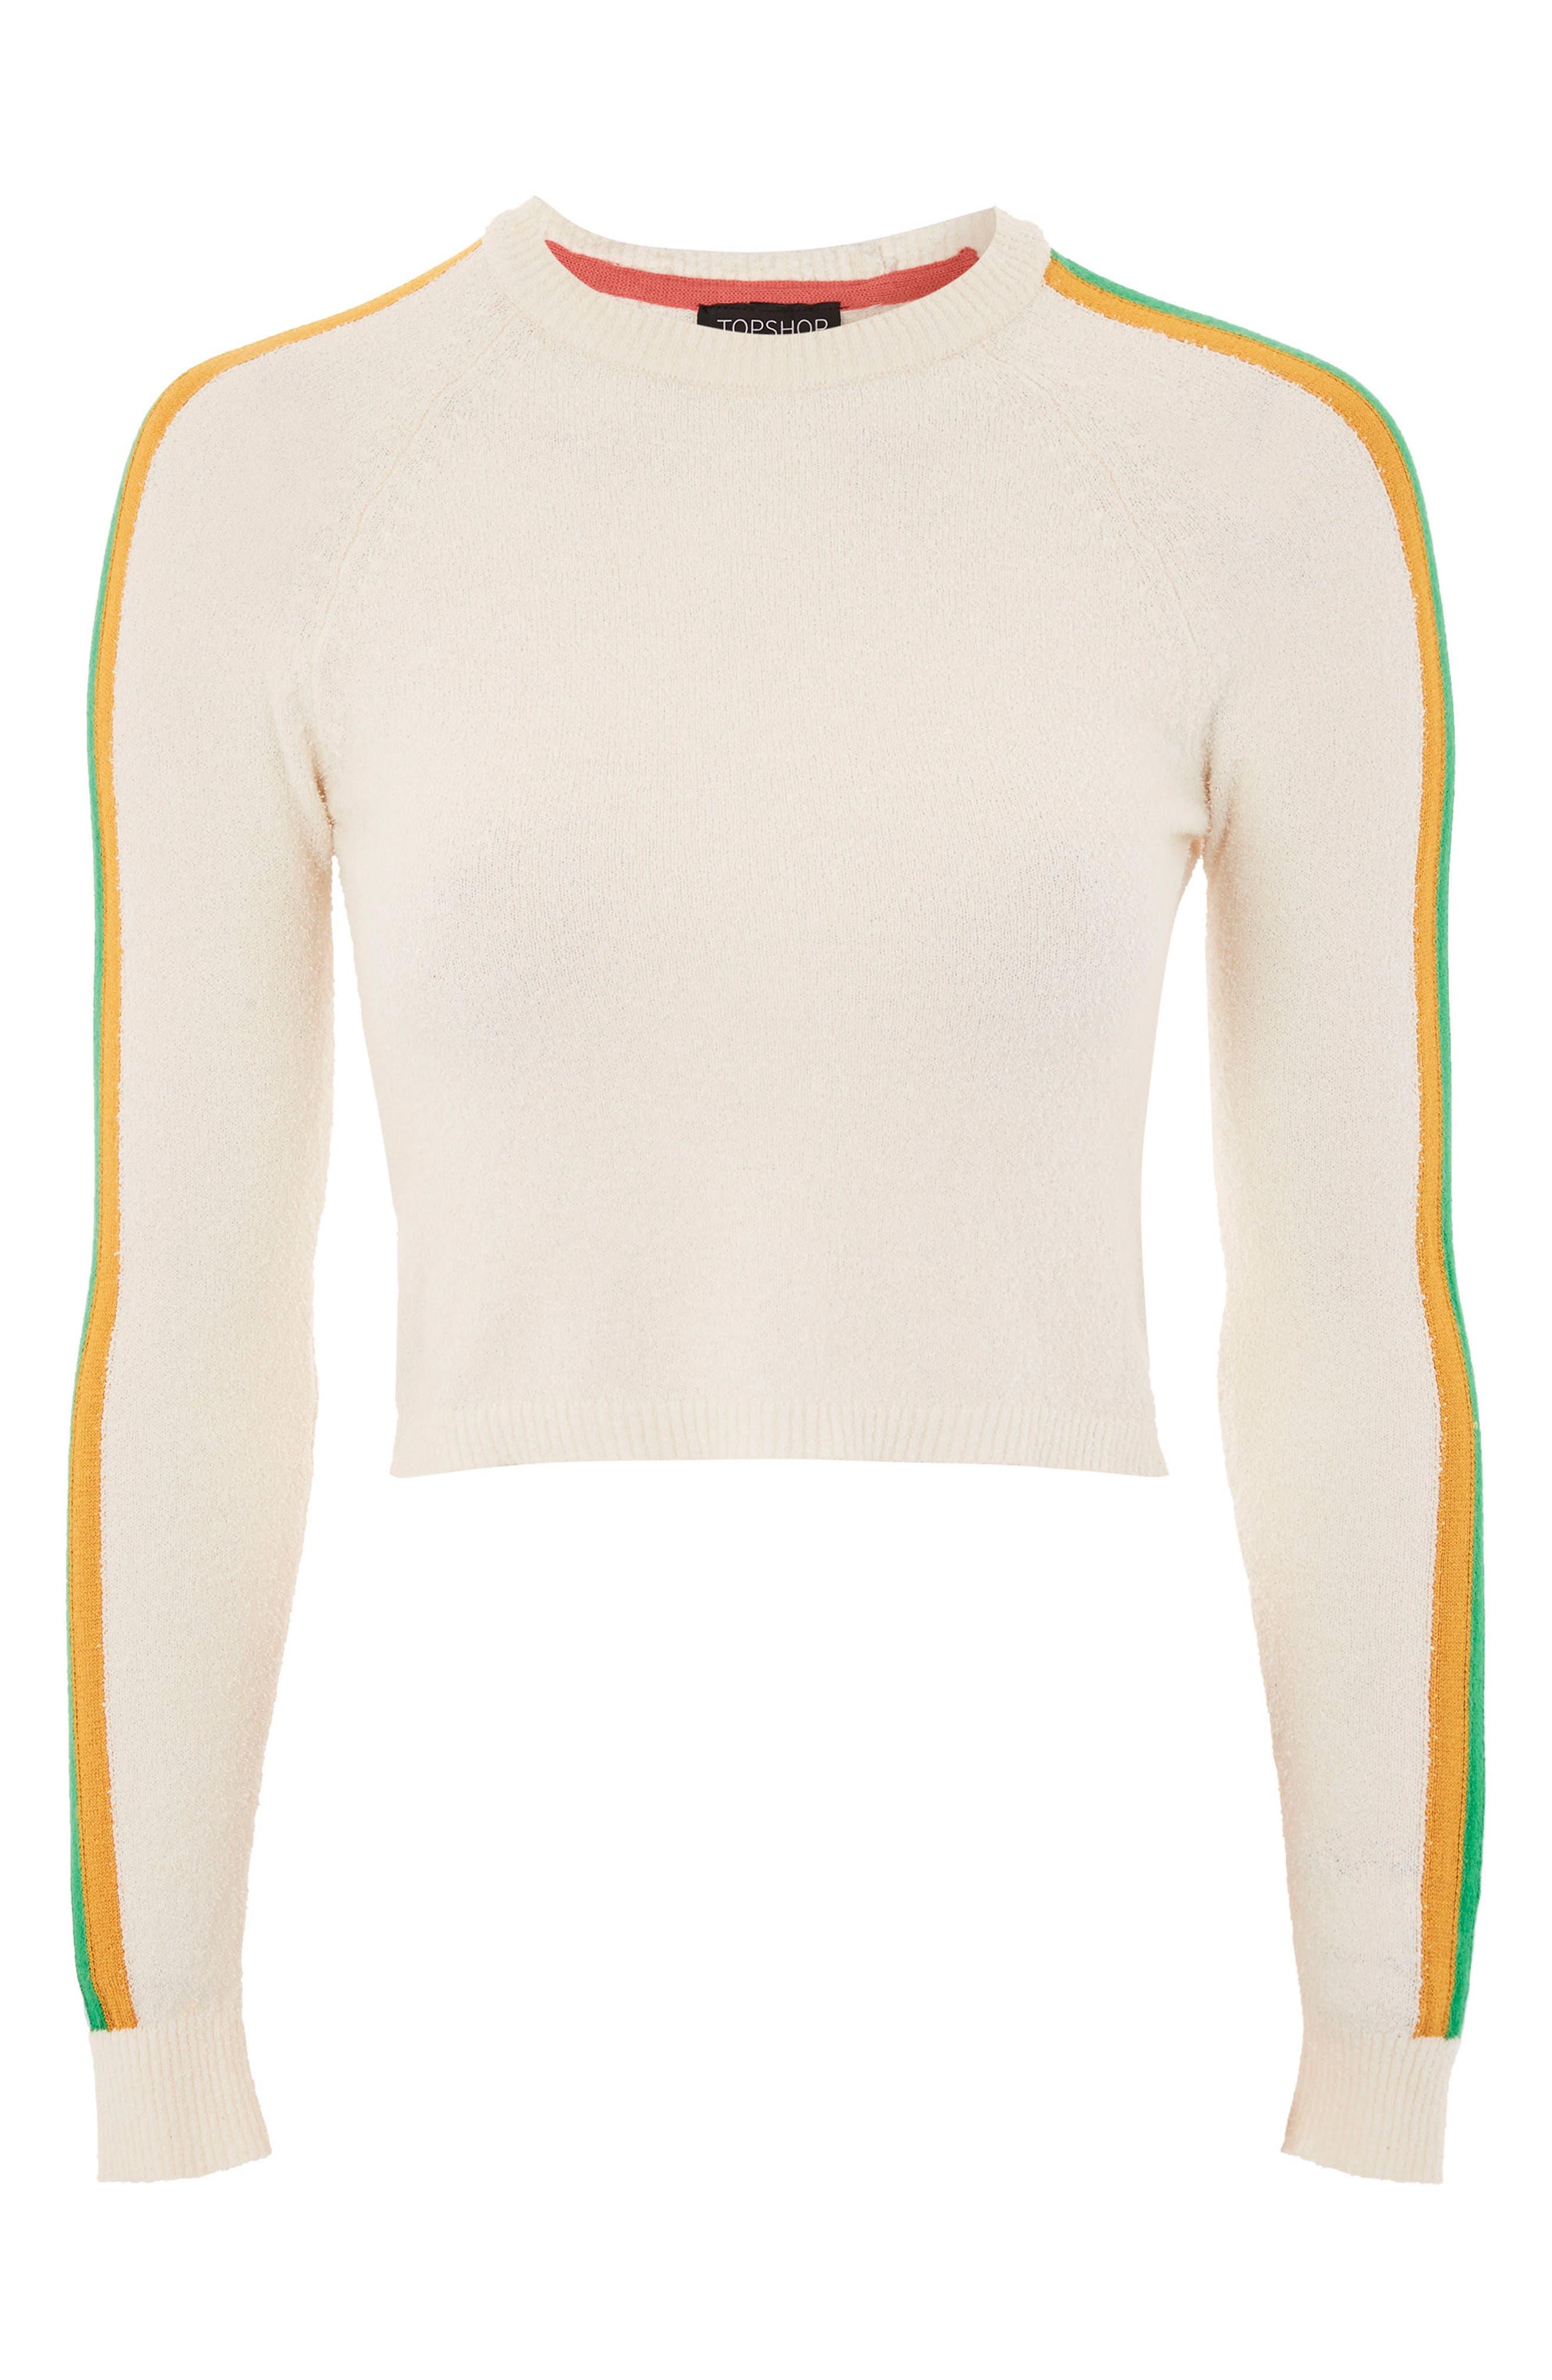 Rainbow Sleeve Knit Top,                             Alternate thumbnail 4, color,                             Cream Multi